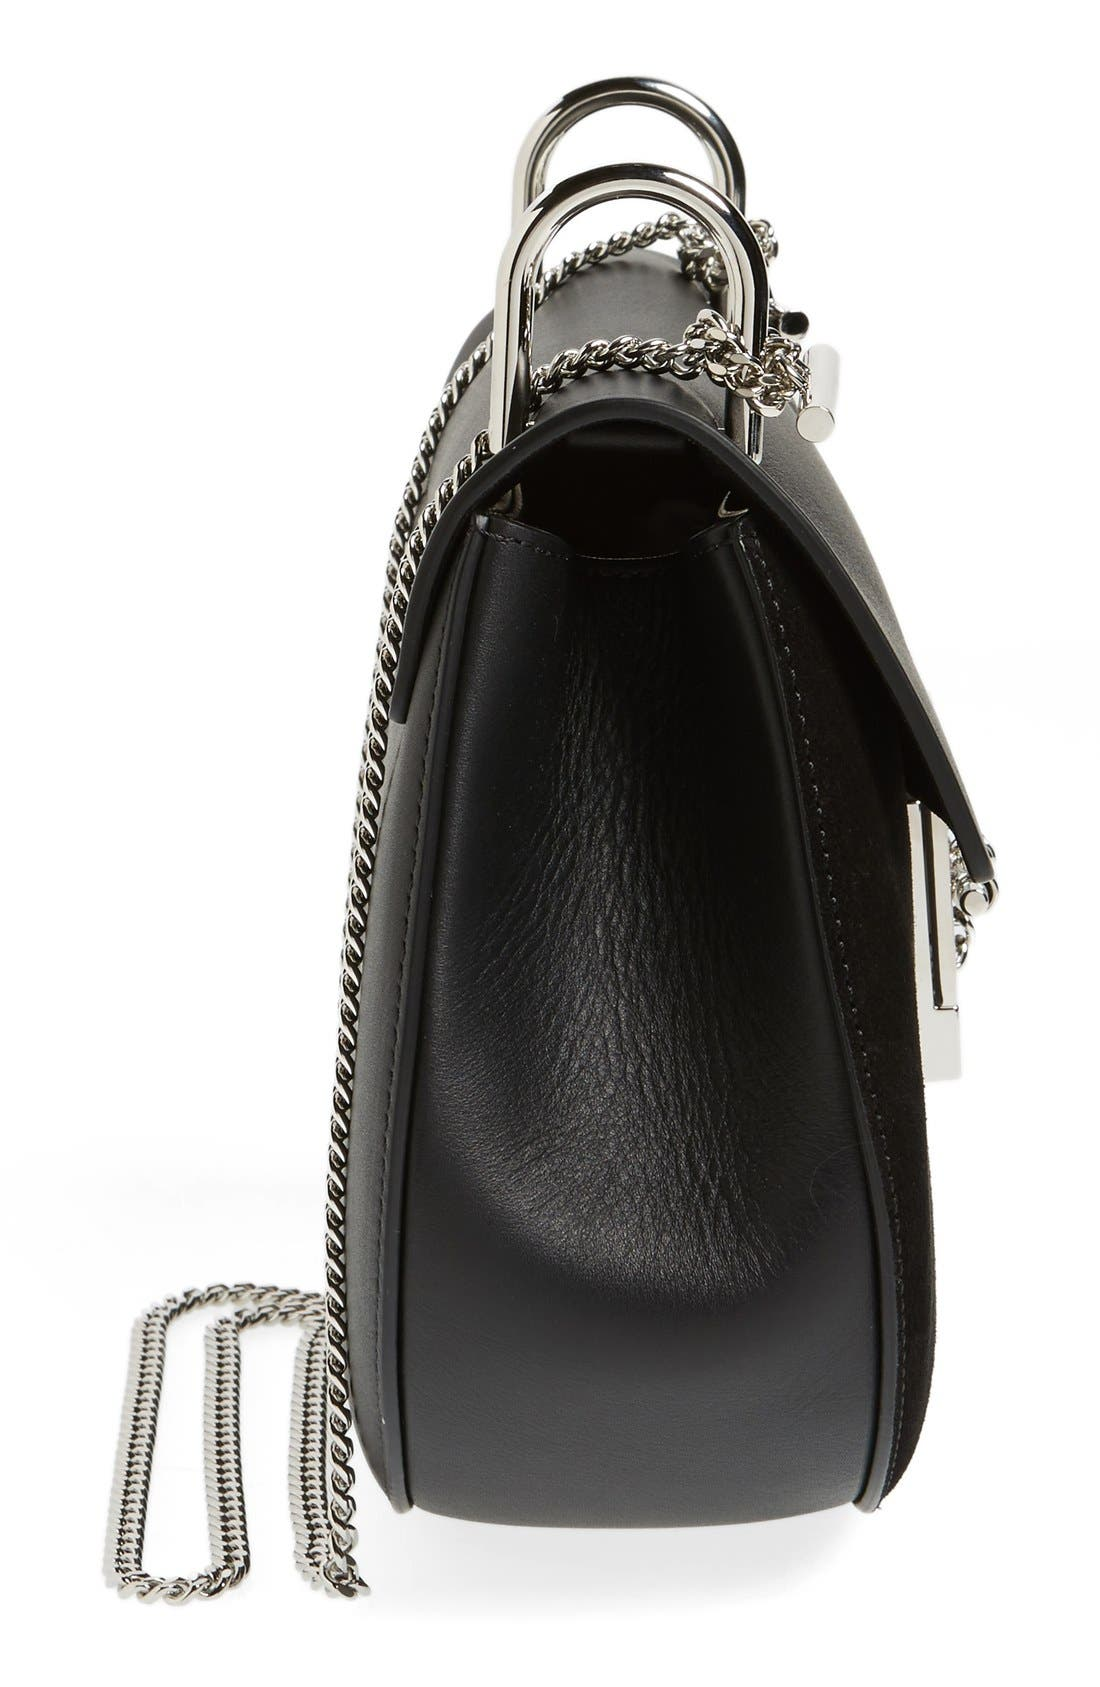 CHLOÉ, Small Drew Leather & Suede Shoulder Bag, Alternate thumbnail 3, color, 001